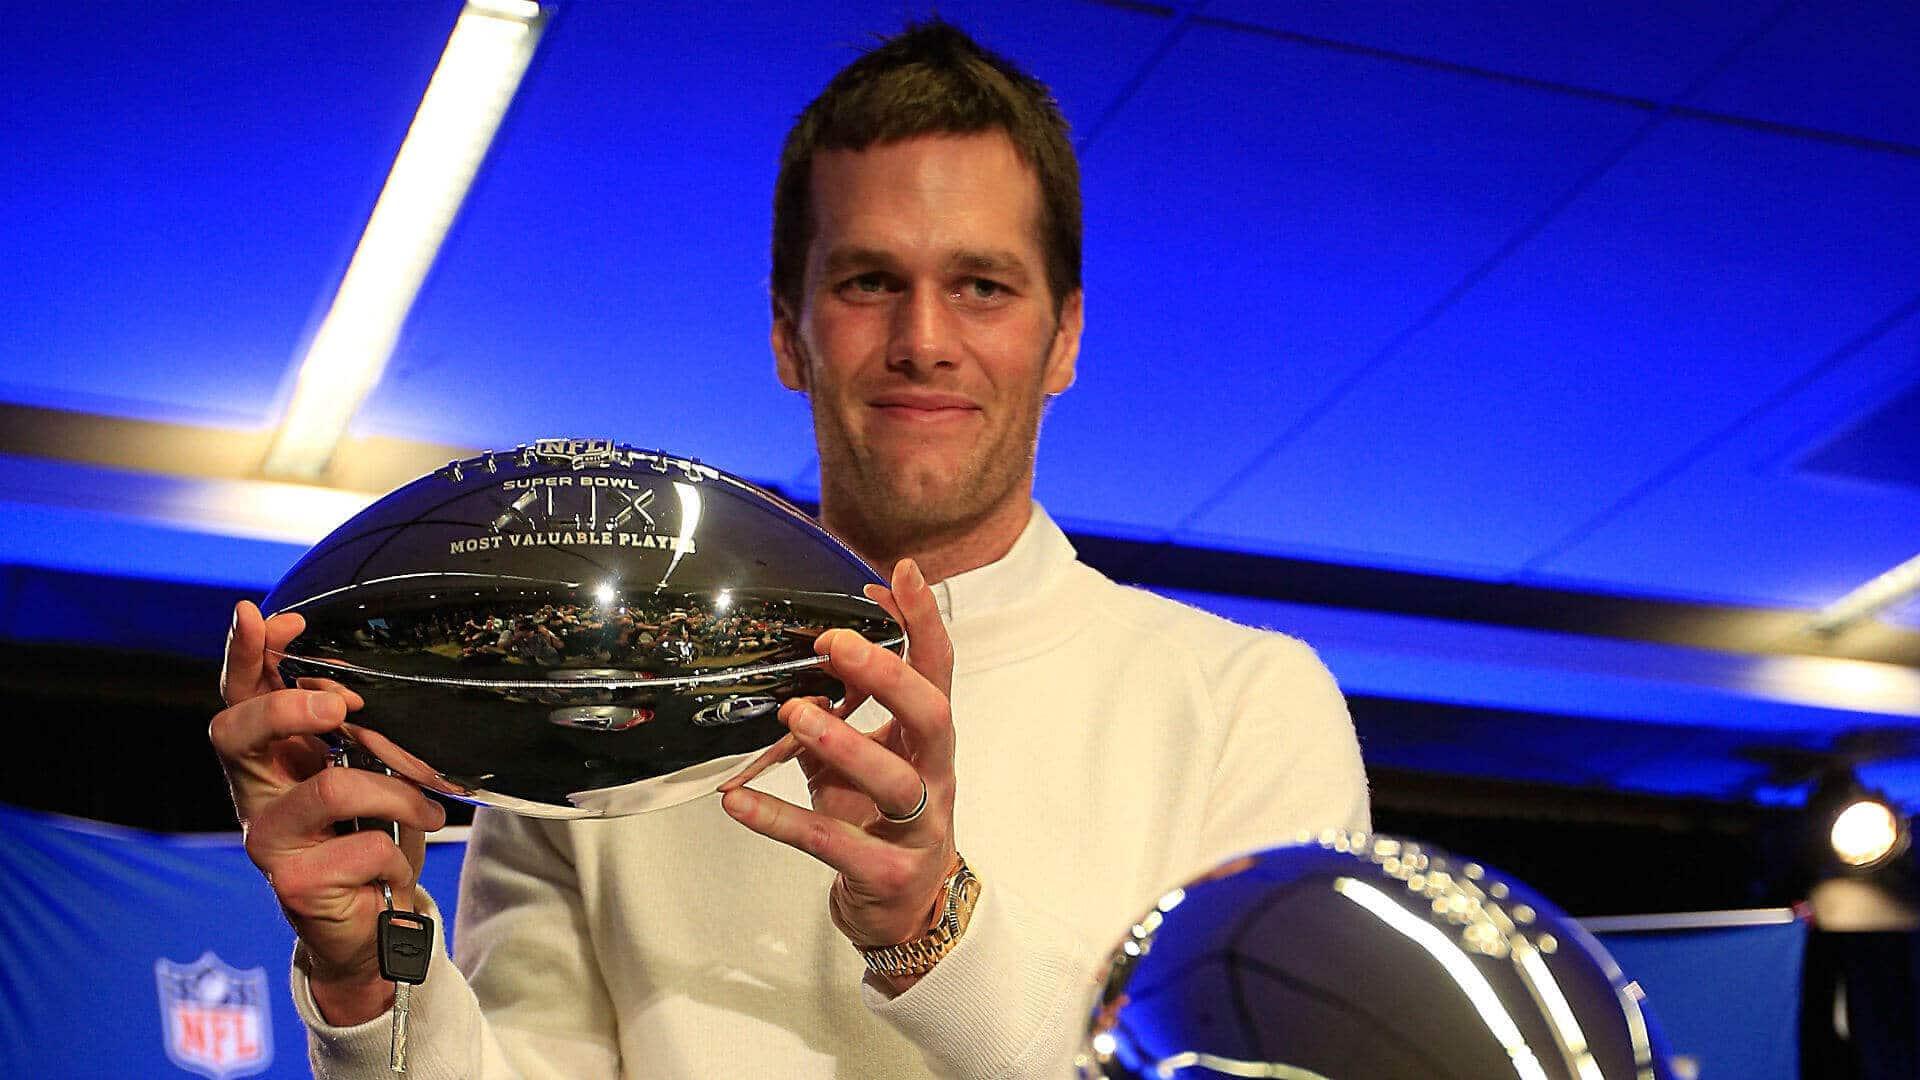 Tom Brady, Super Bowl MVP for Super Bowl 49